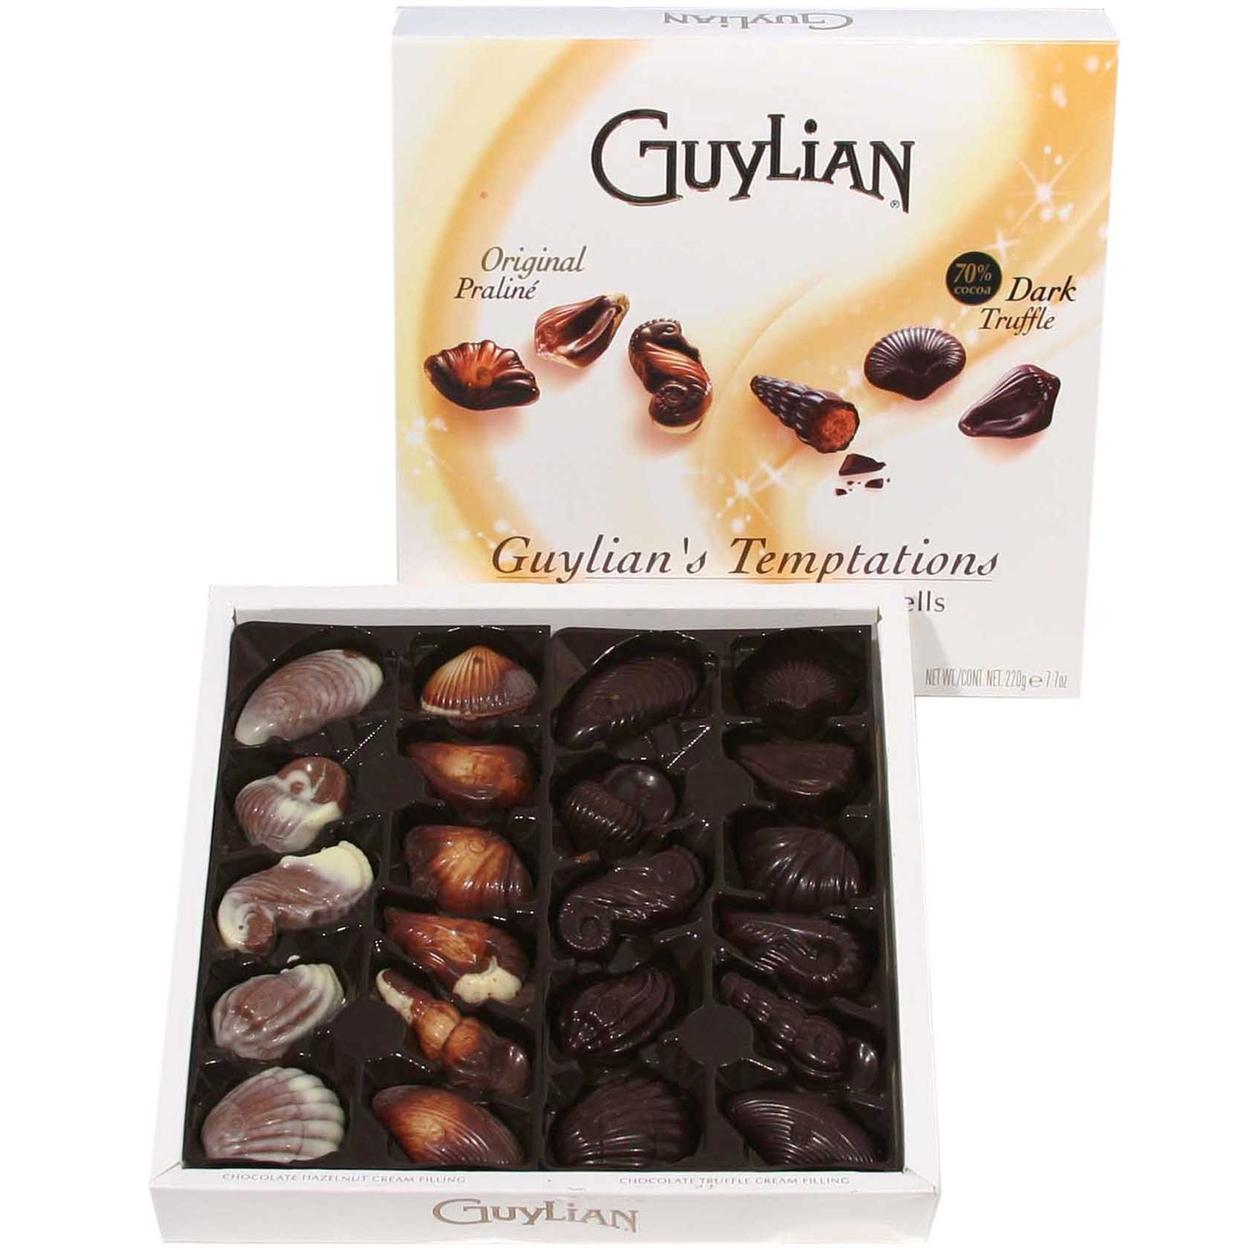 Guylian's Temptations Chocolate Gift Box • Guylian Belgian ...